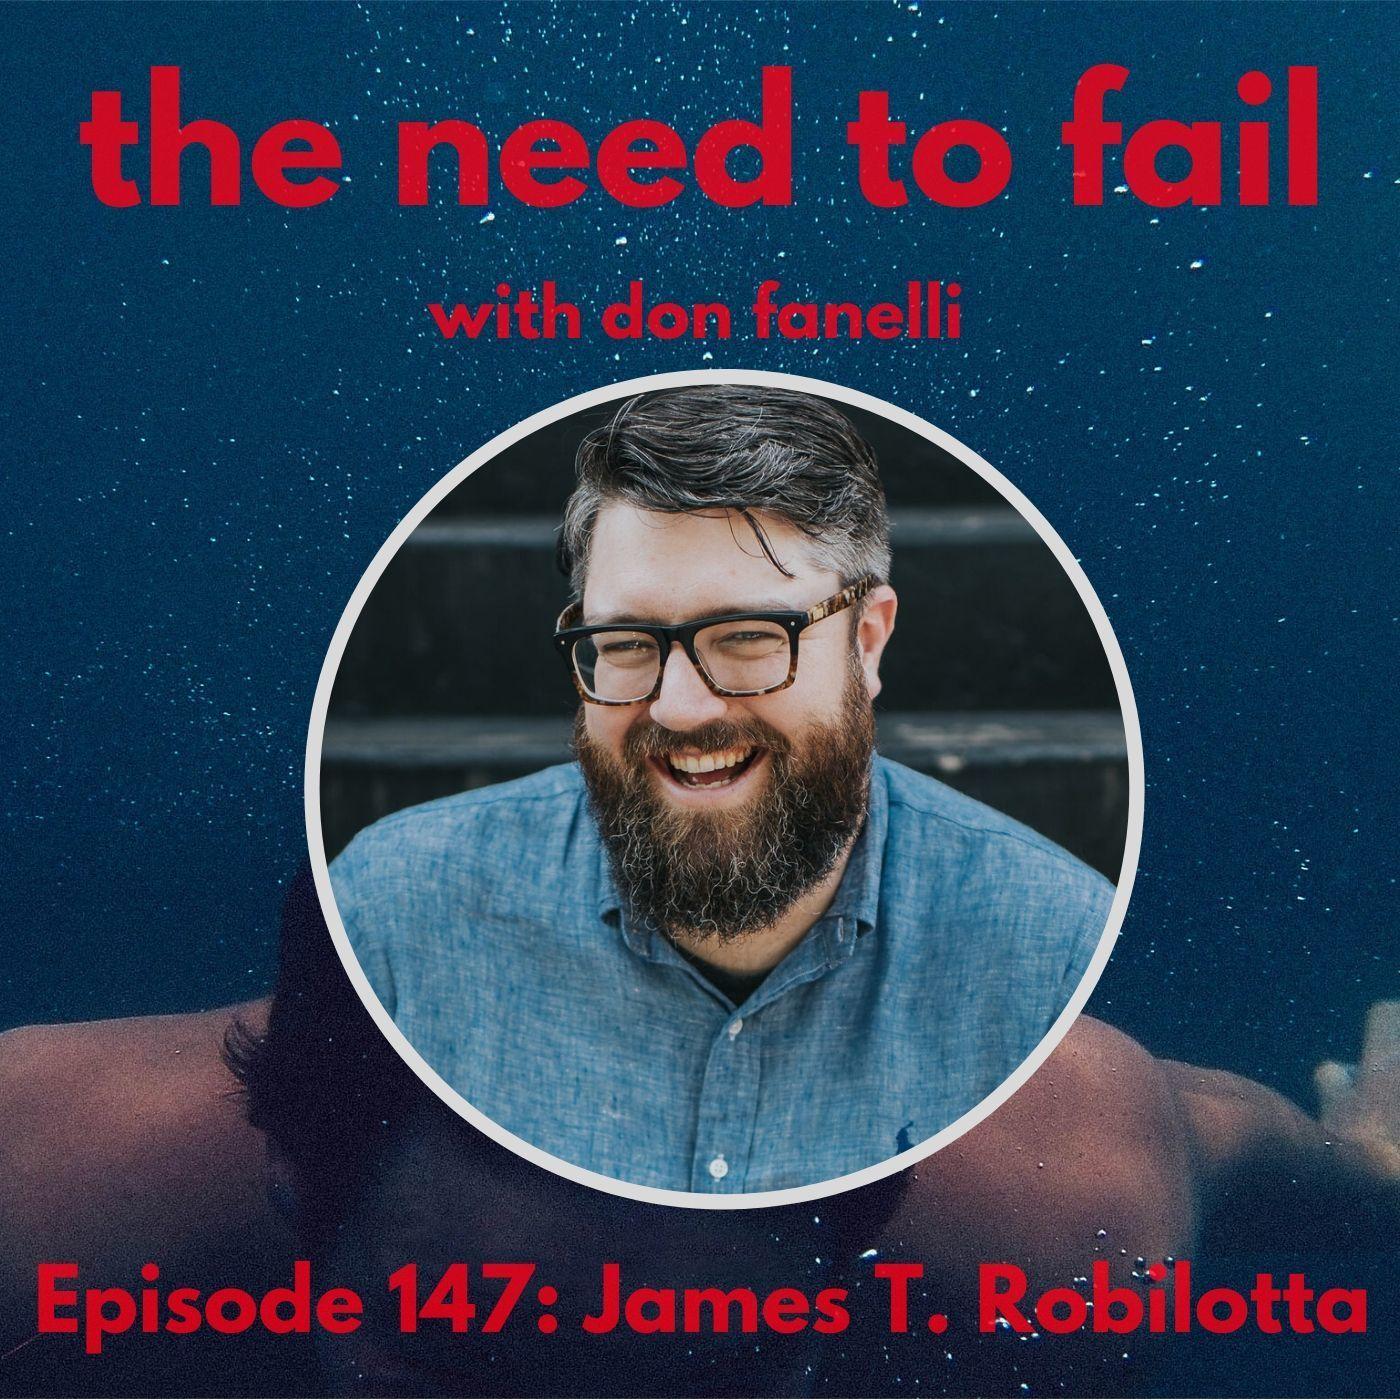 Episode 147: James T. Robilotta